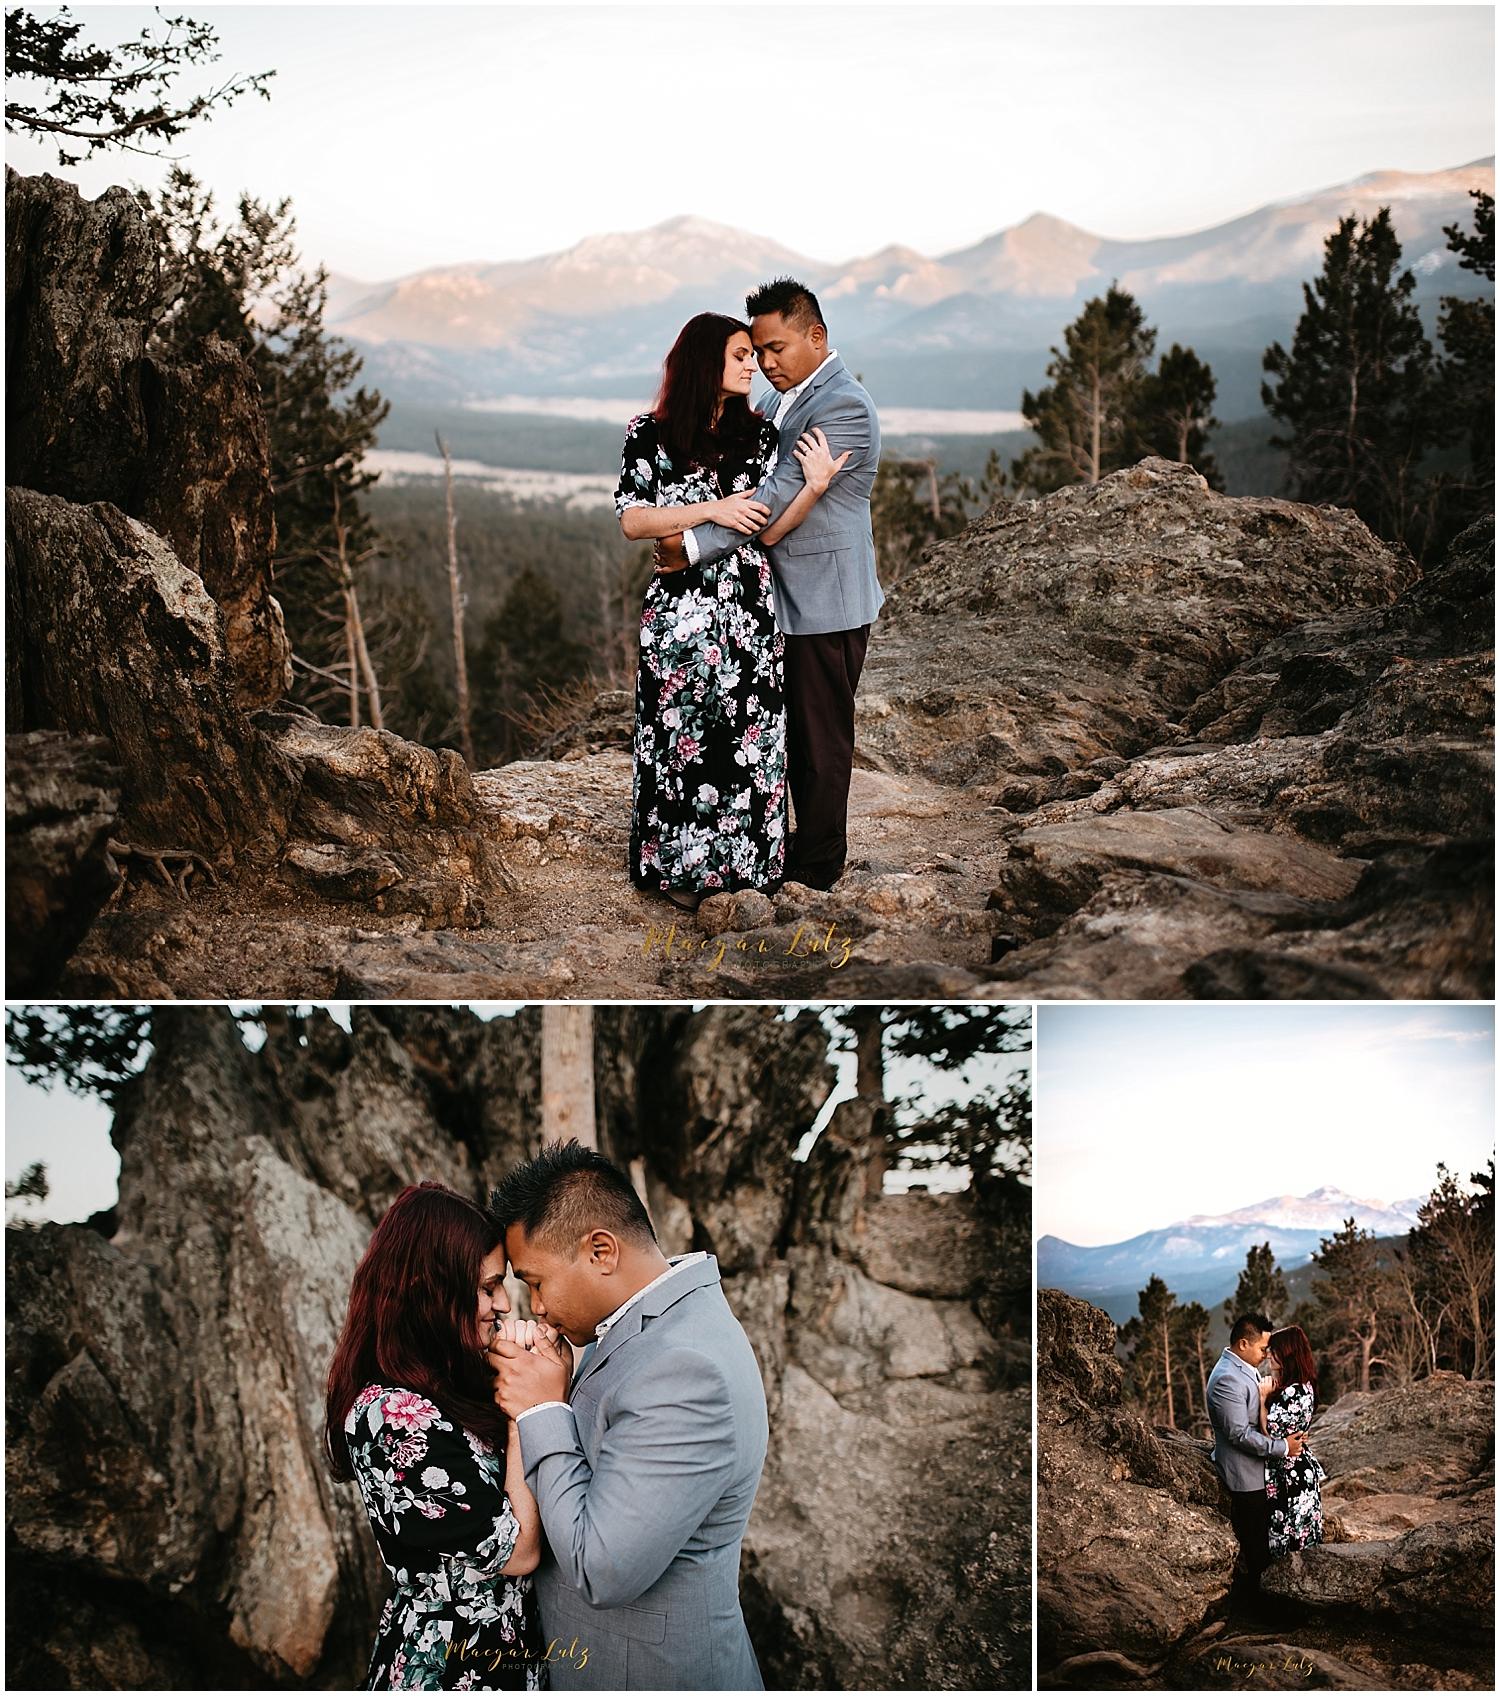 Destination-engagement-wedding-photographer-Colorado-Rocky-Mountain-National-Park-Session_0052.jpg